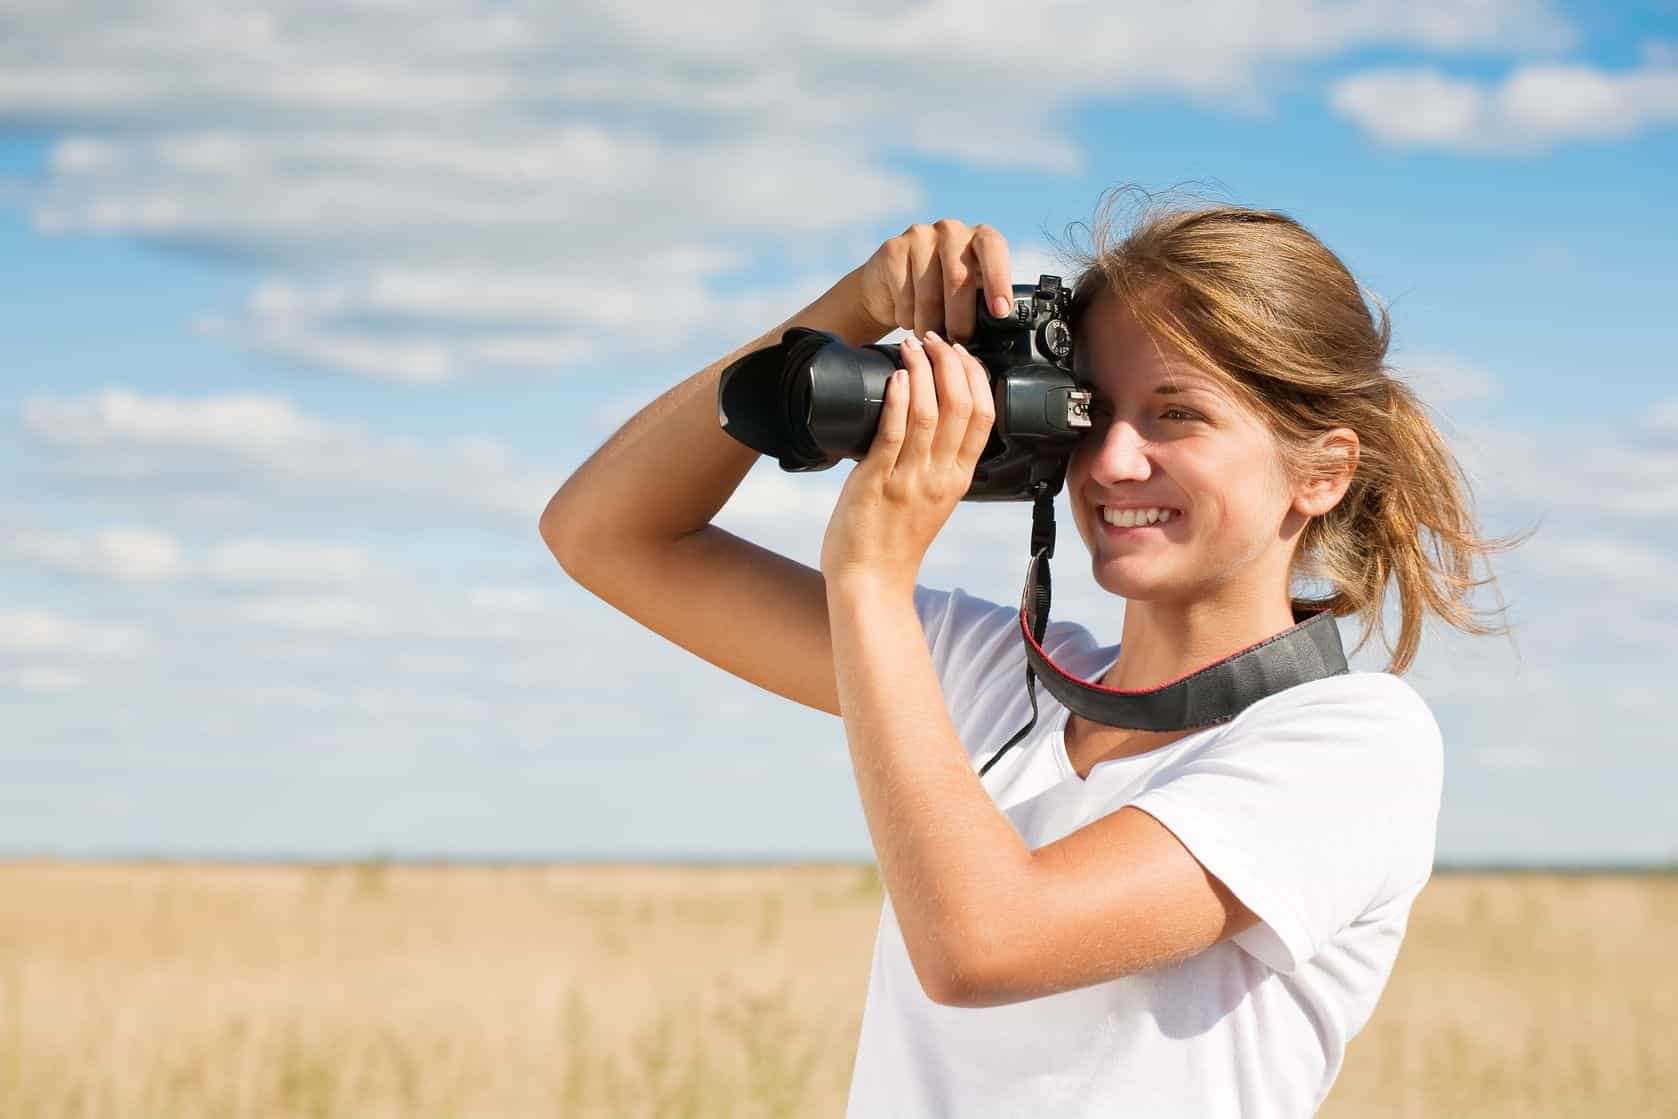 Innovative Fotos schießen